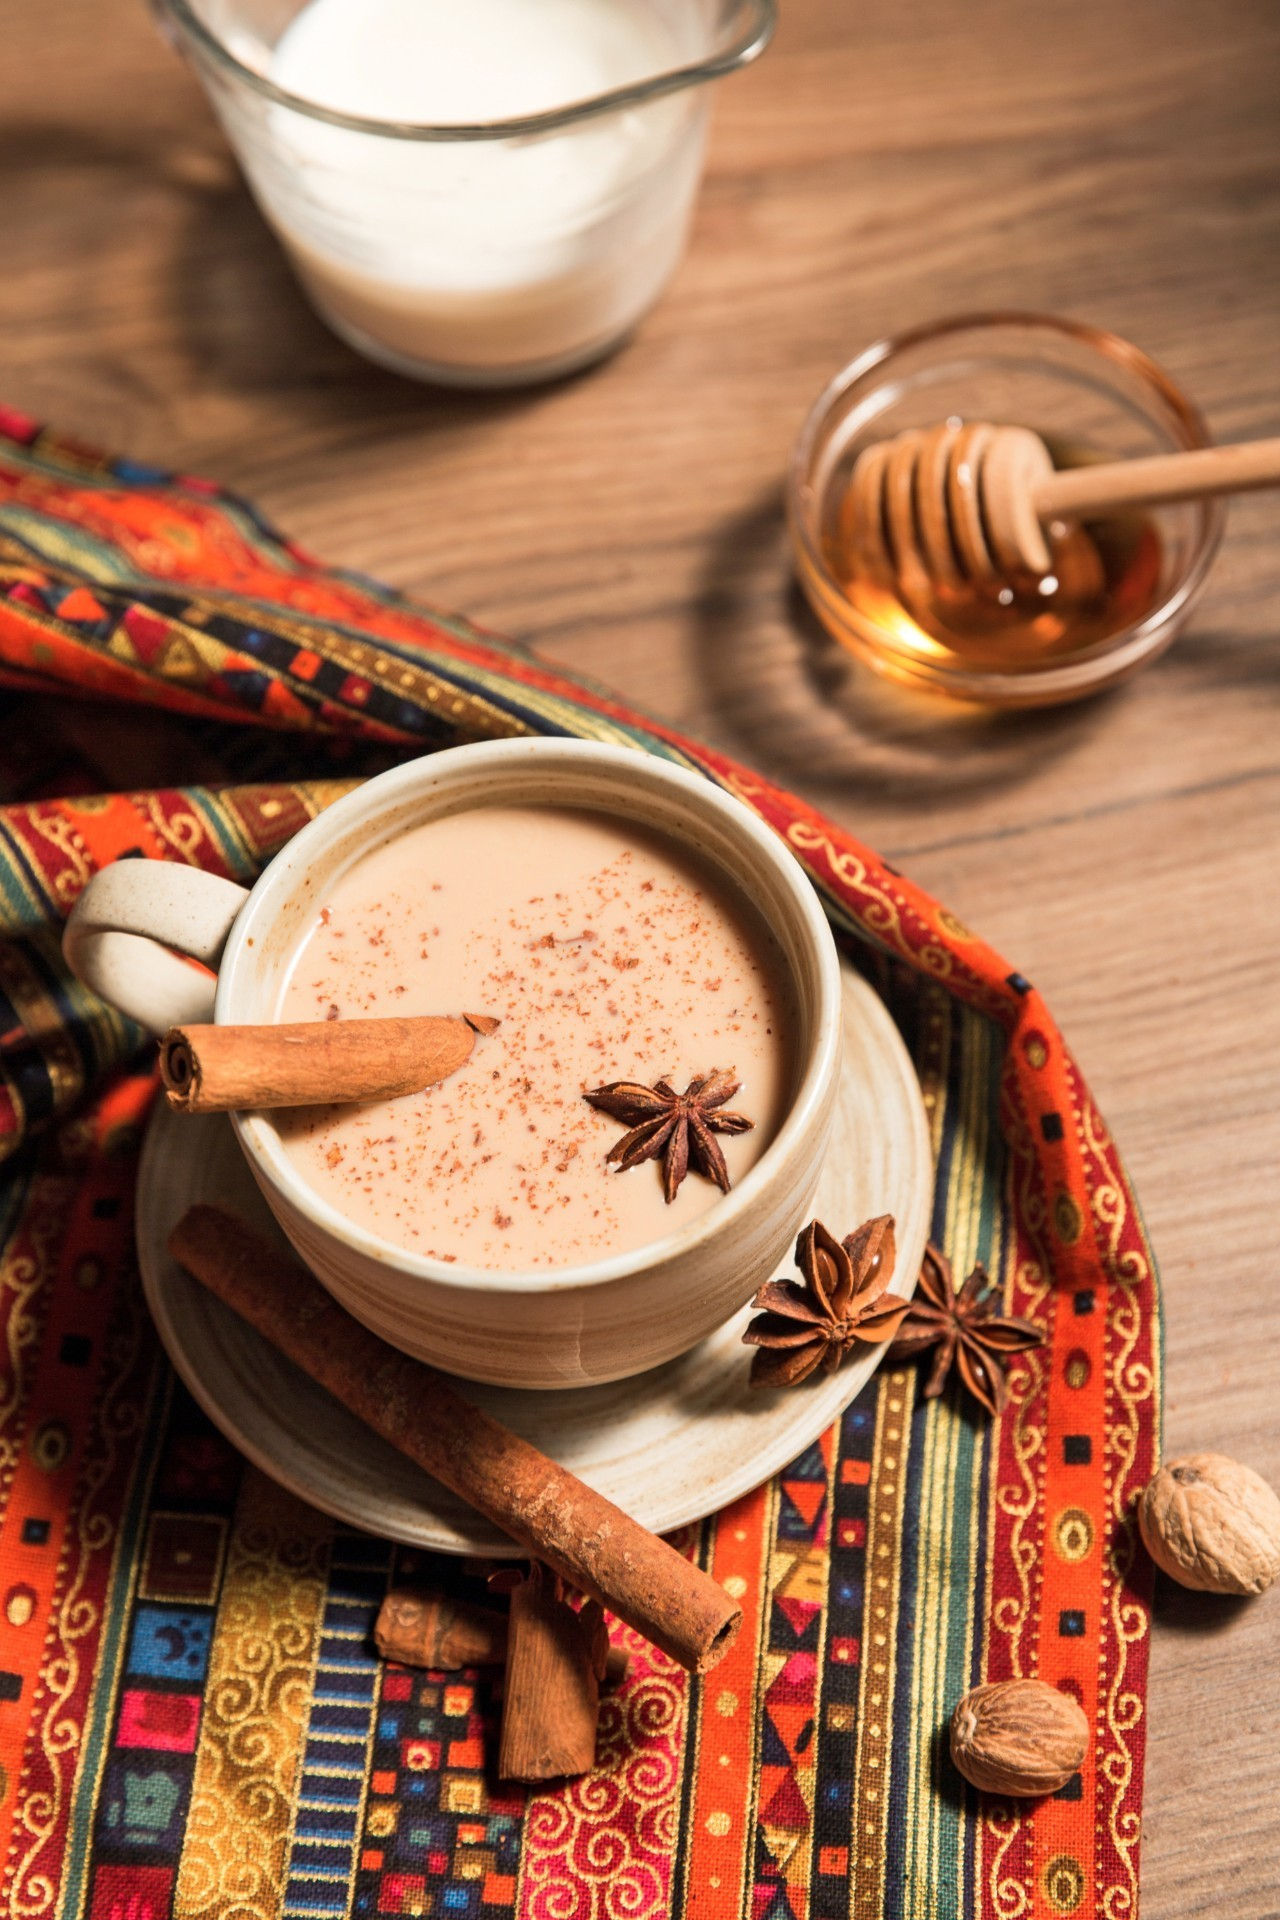 ▶️星爸爸的海外爆款chai latte,快学着做!